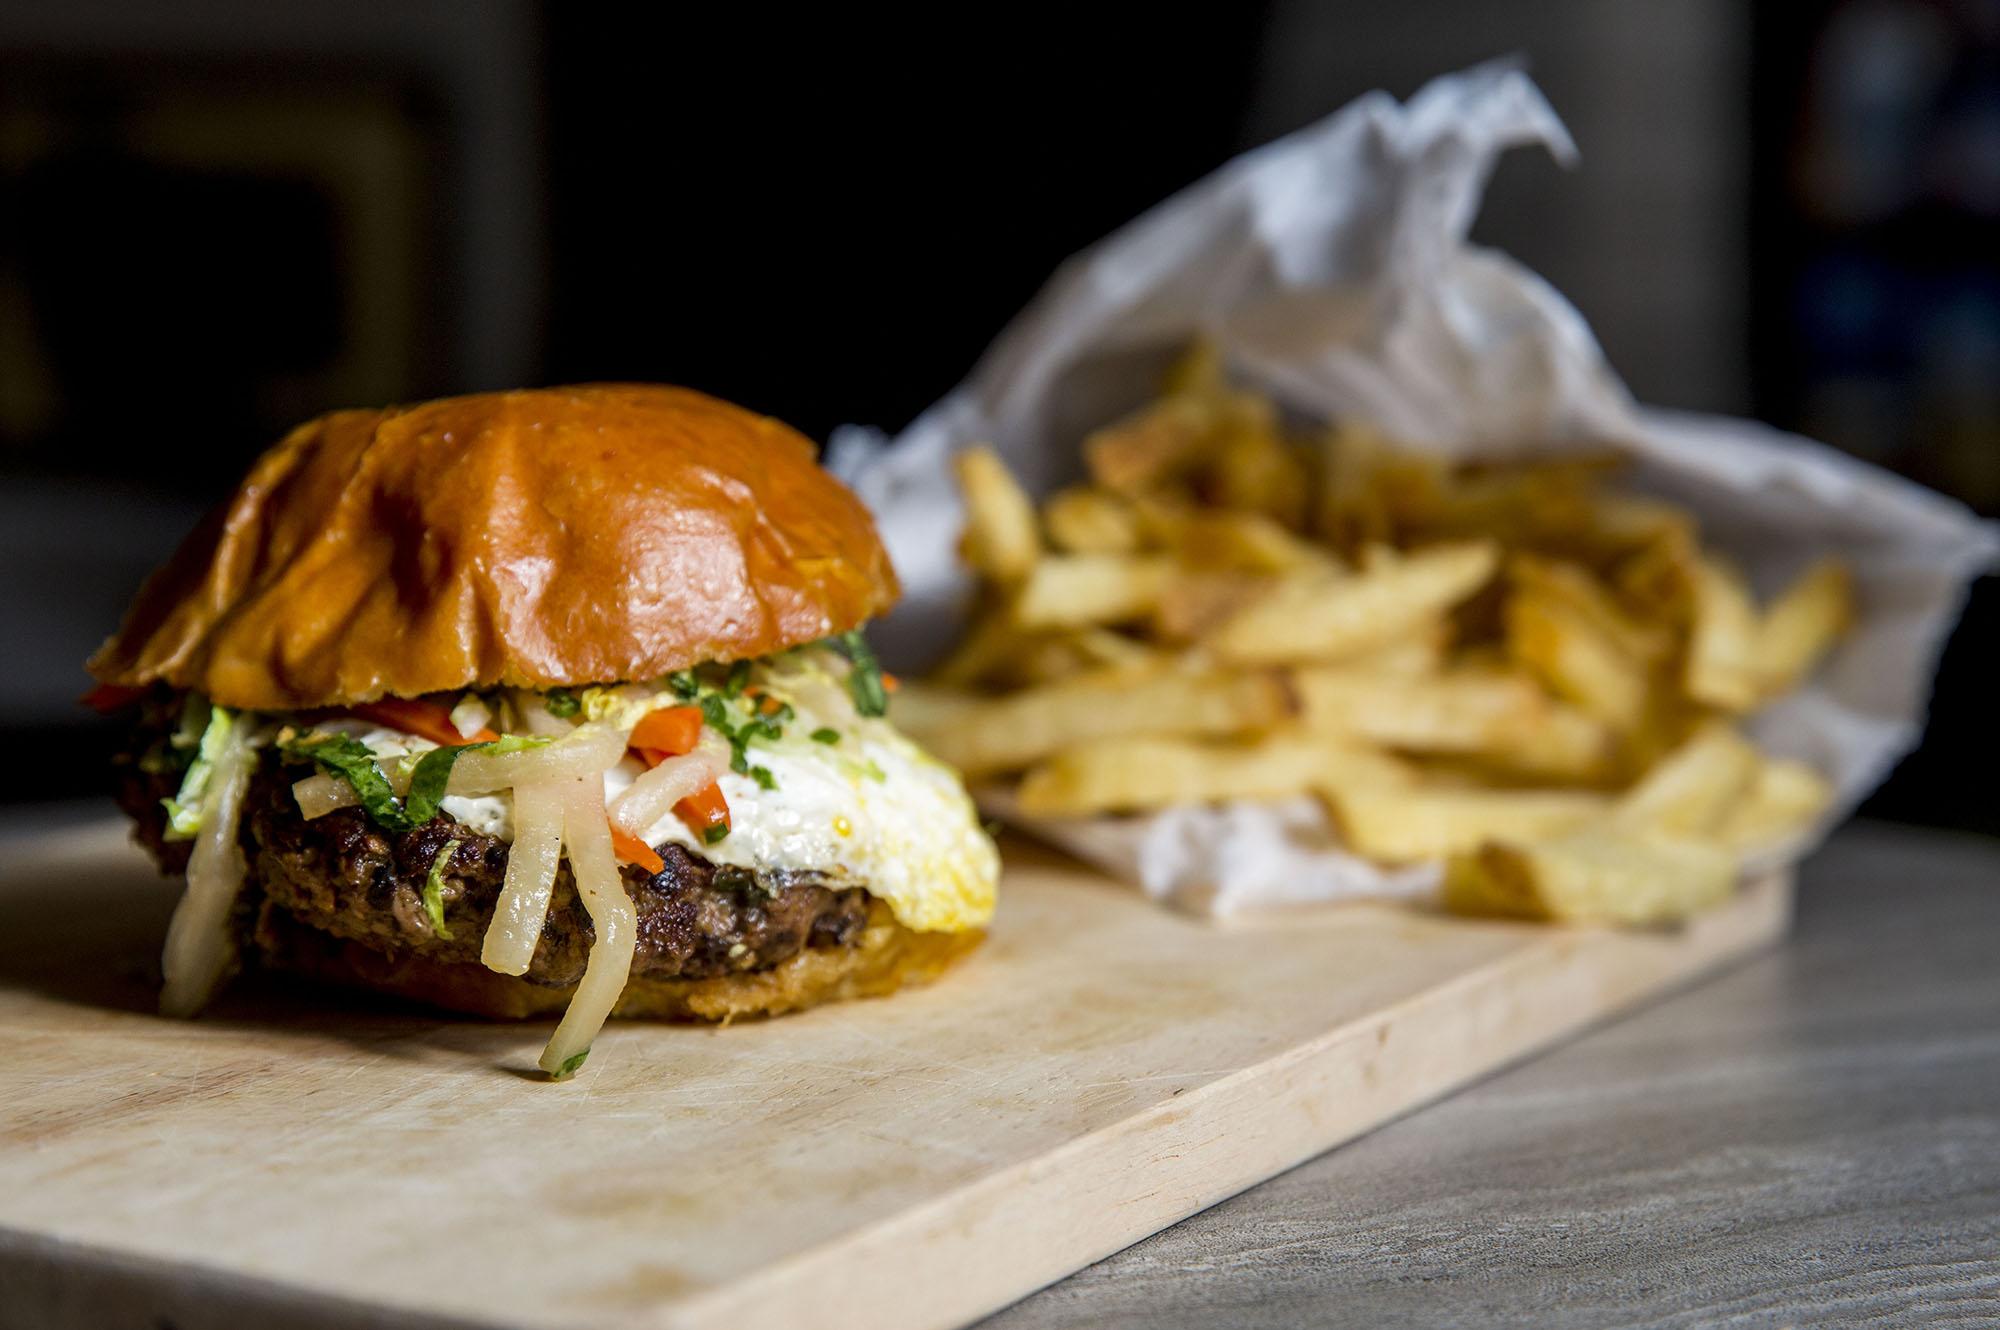 A burger and fries at Feed Co. Burgers